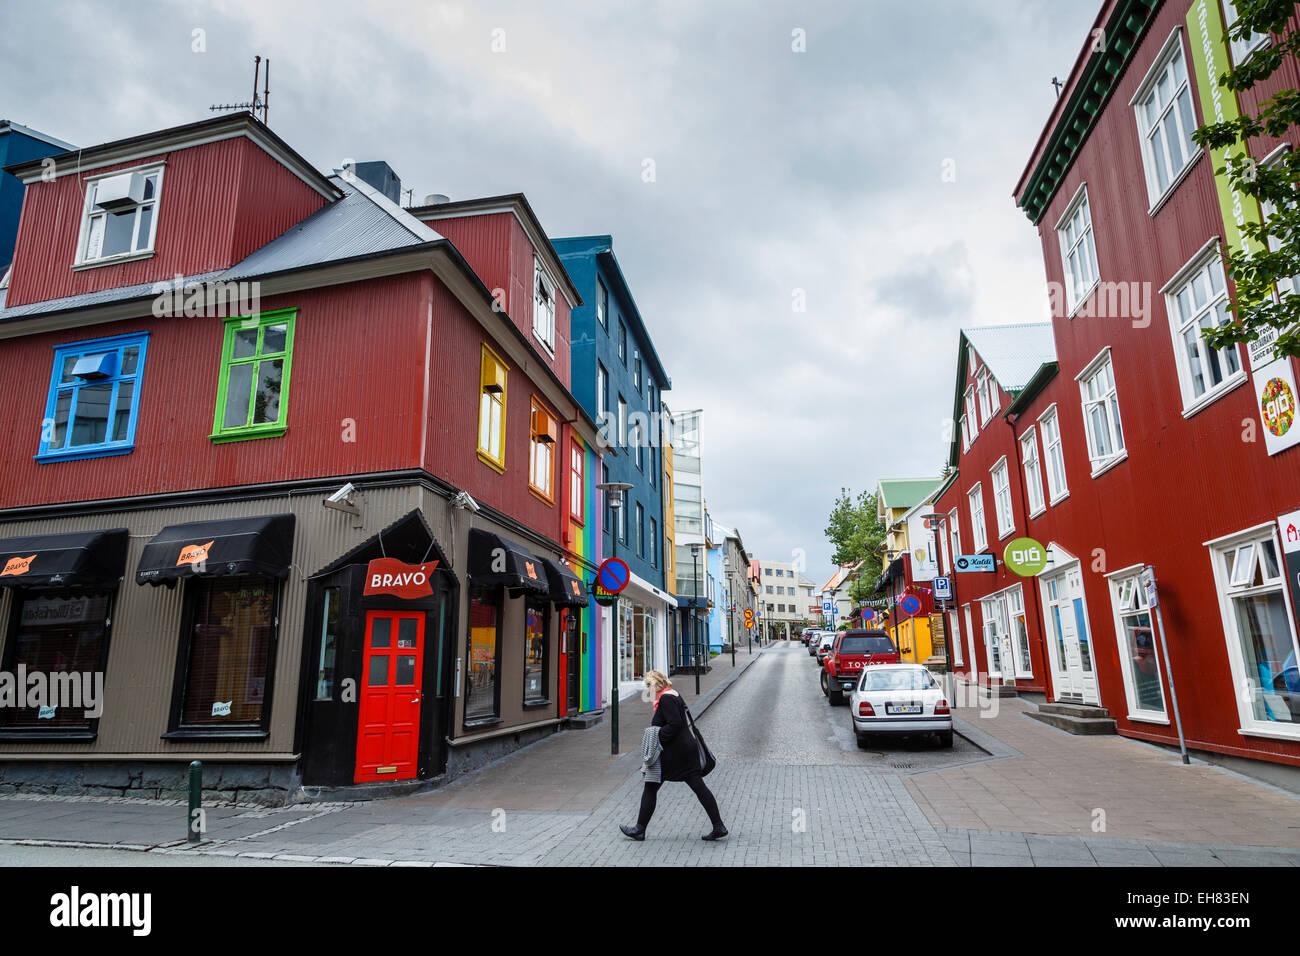 Scena di strada a Reykjavik, Islanda, regioni polari Immagini Stock